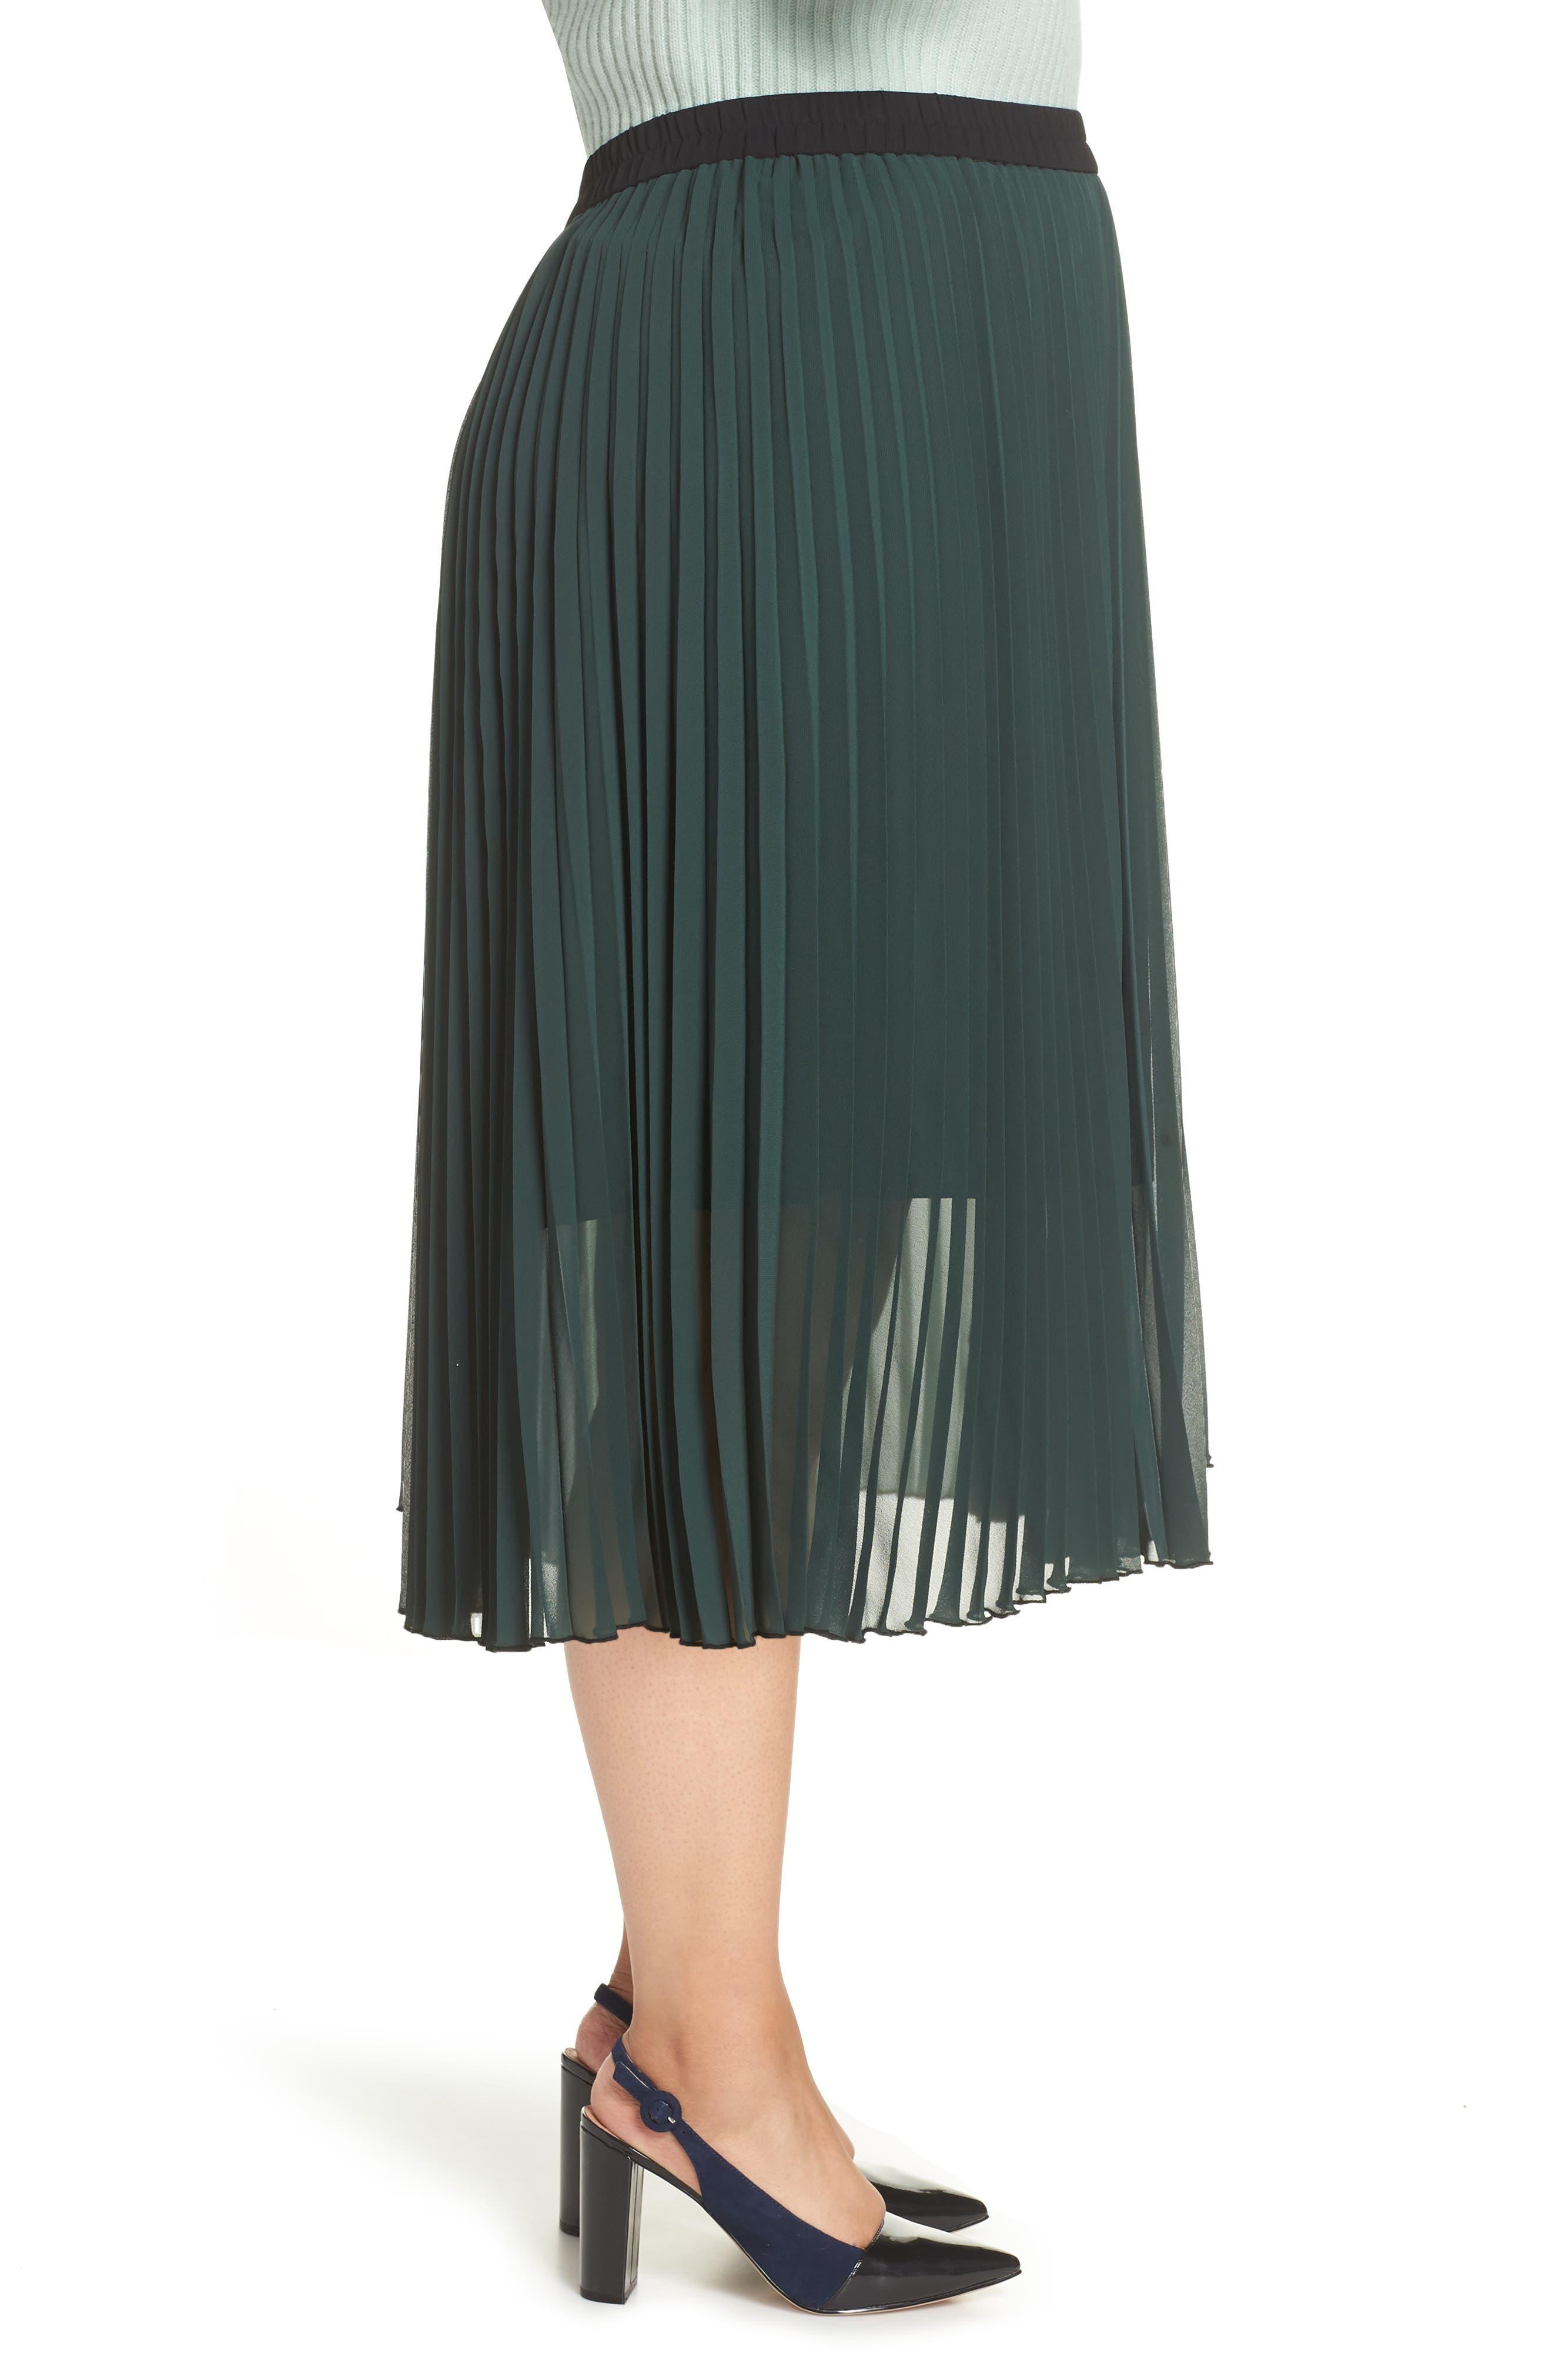 x Atlantic-Pacific Colorblock Pleated Midi Skirt,                             Alternate thumbnail 3, color,                             GREEN- BLACK COLORBLOCK